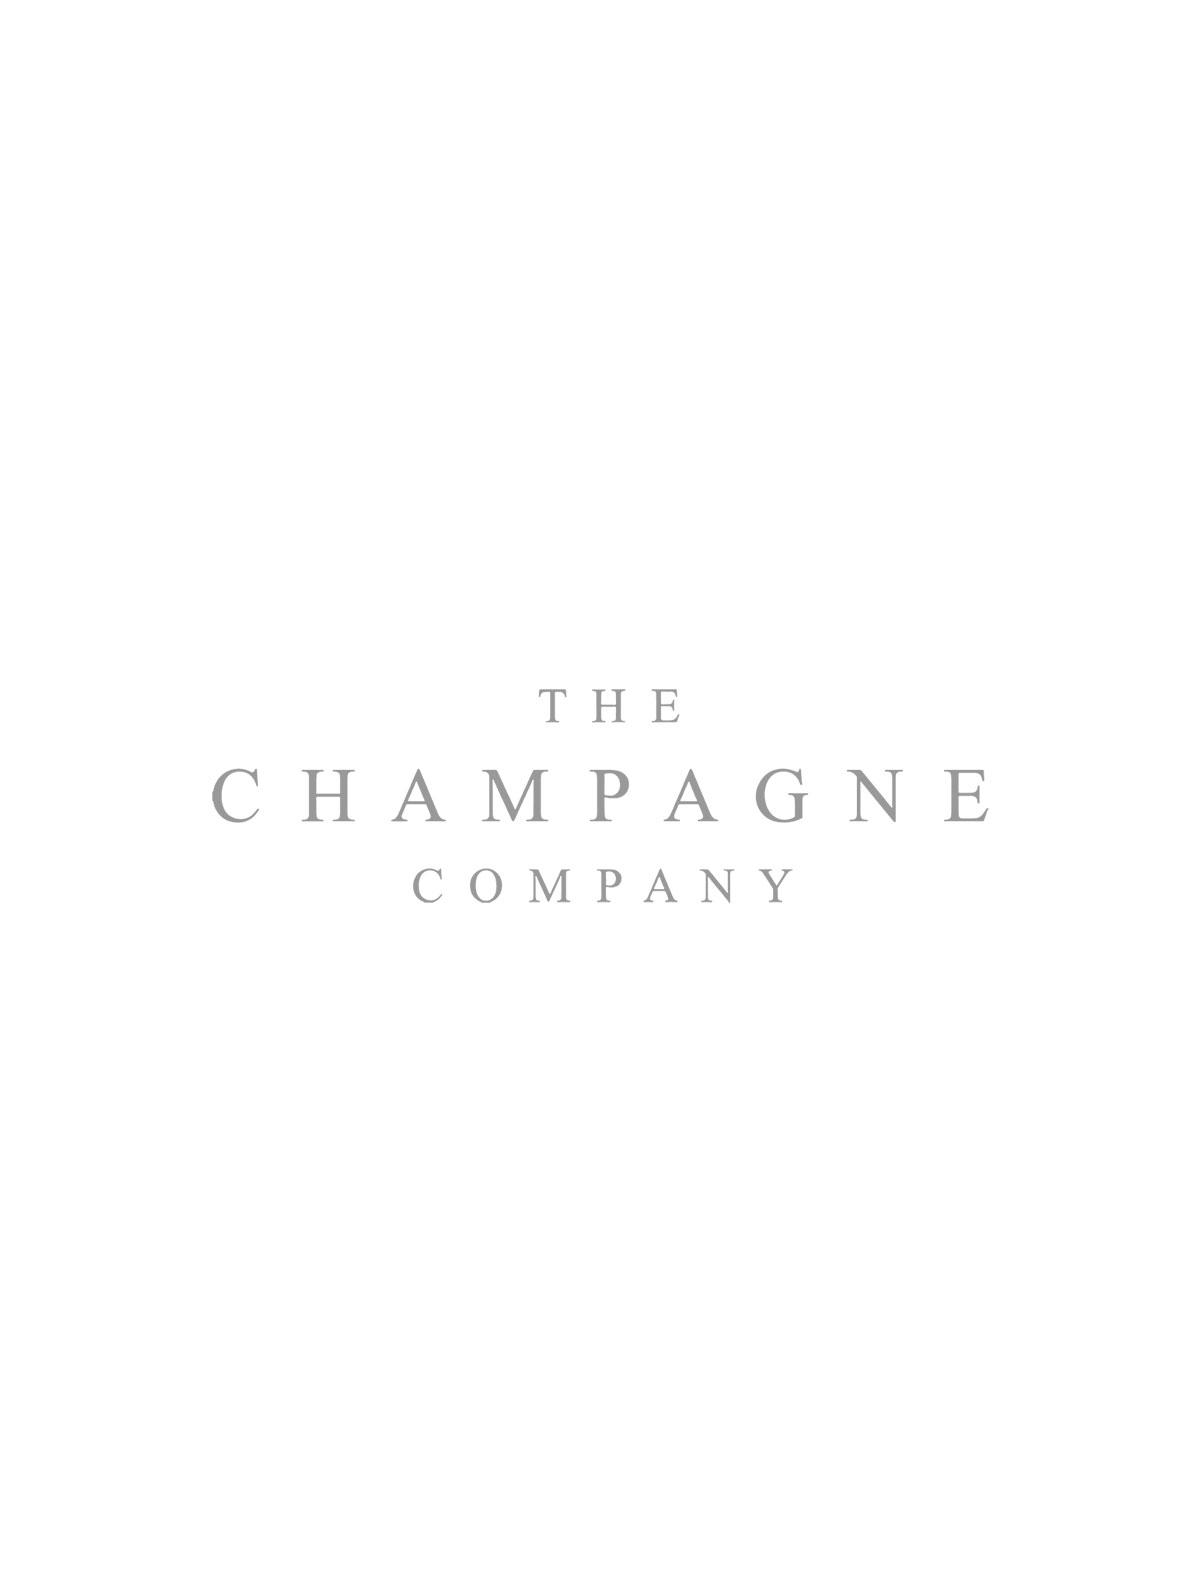 Nikka Rita 30 yr Apple Brandy Whisky 70cl